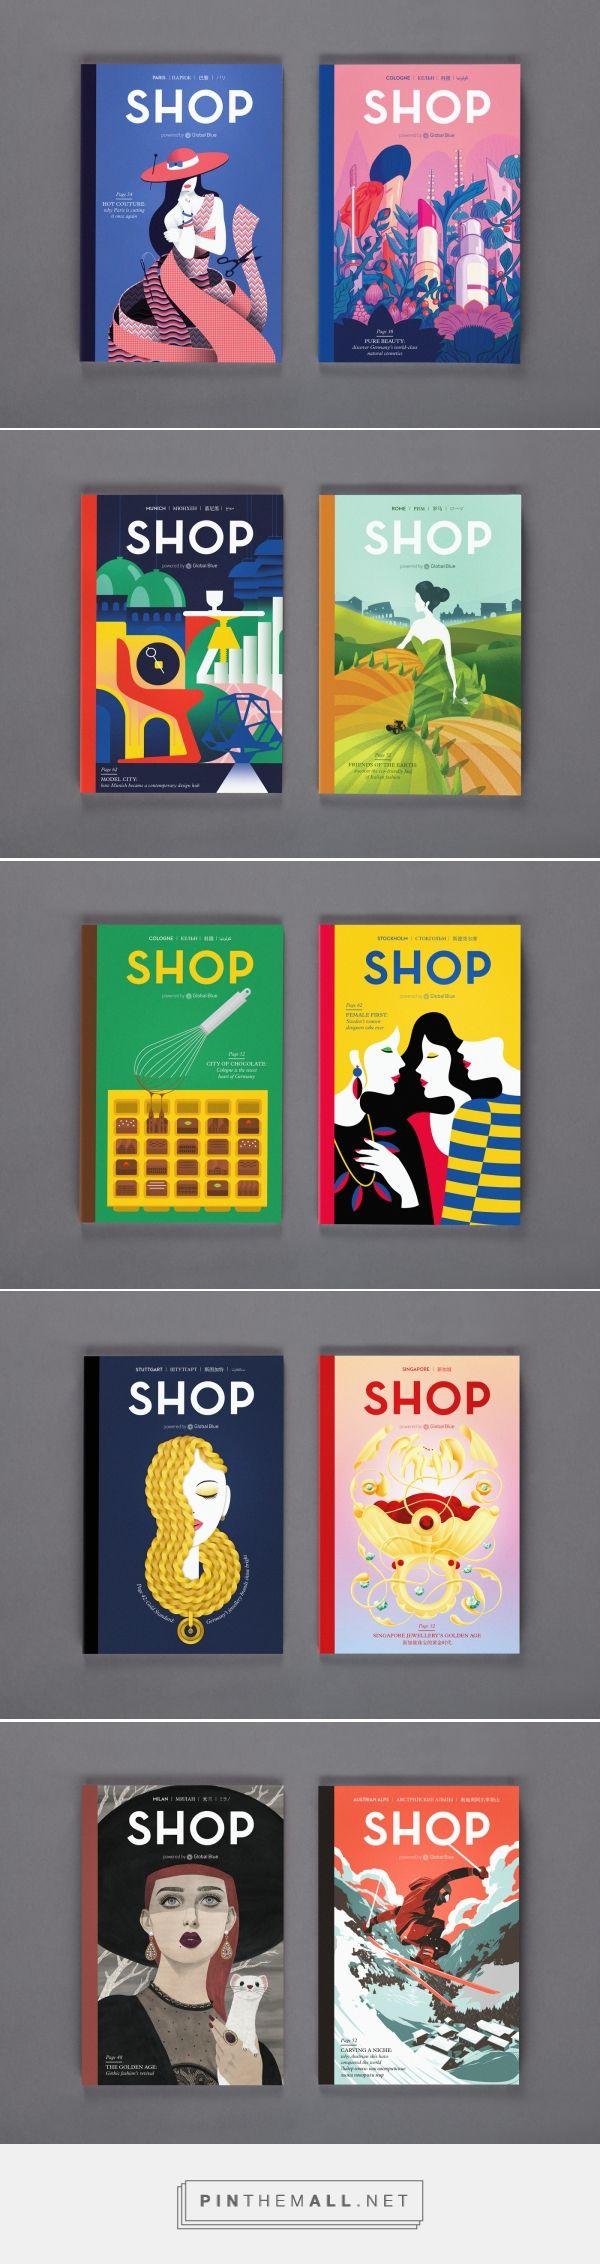 SHOP Magazine 2015 | Design by S-T